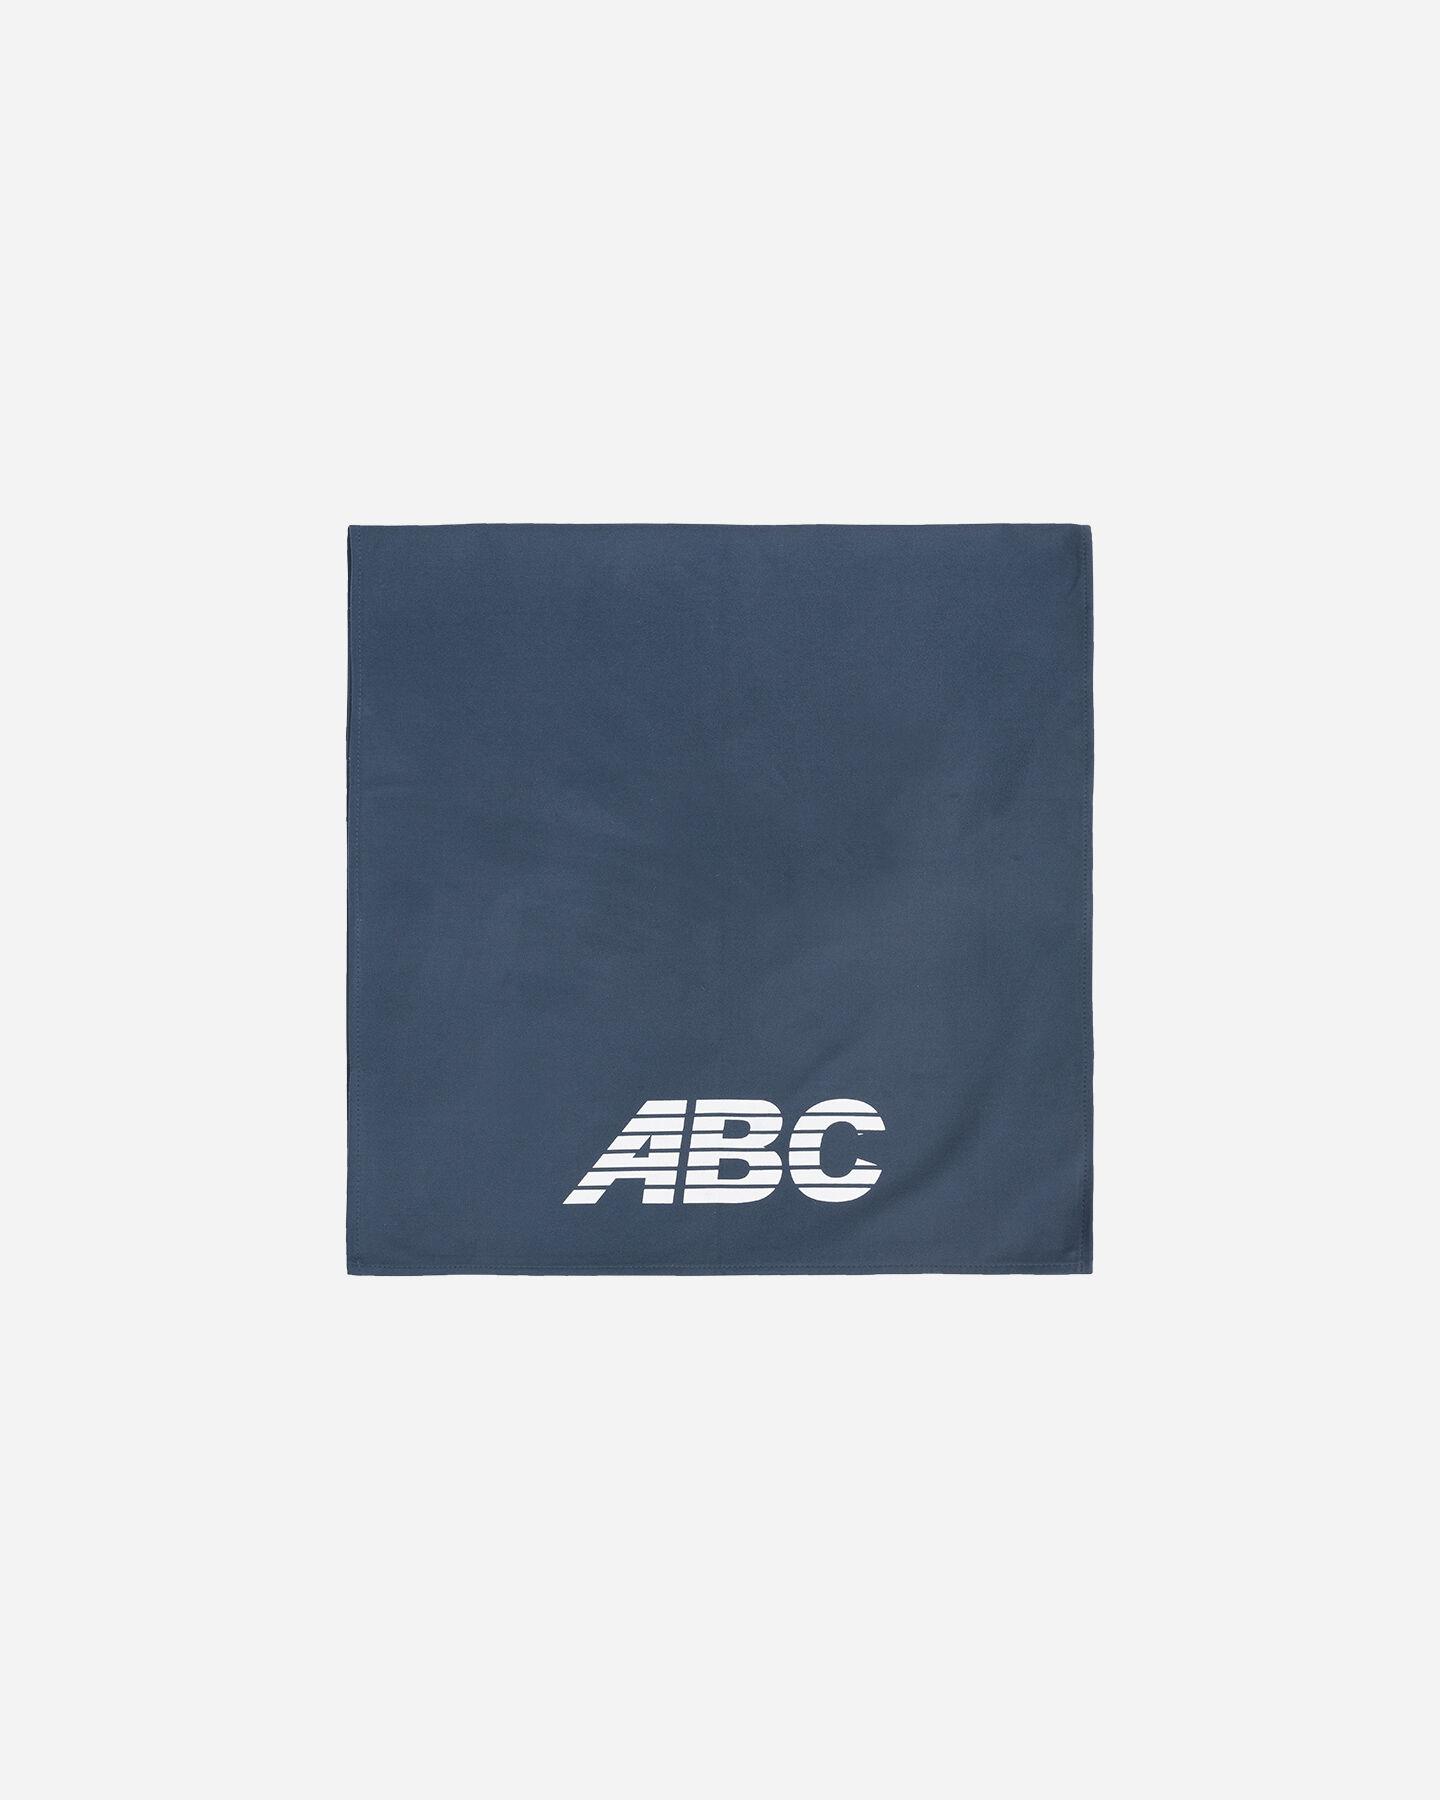 Telo ABC BASIC MICROFIBER 100X50 S4069031 scatto 1